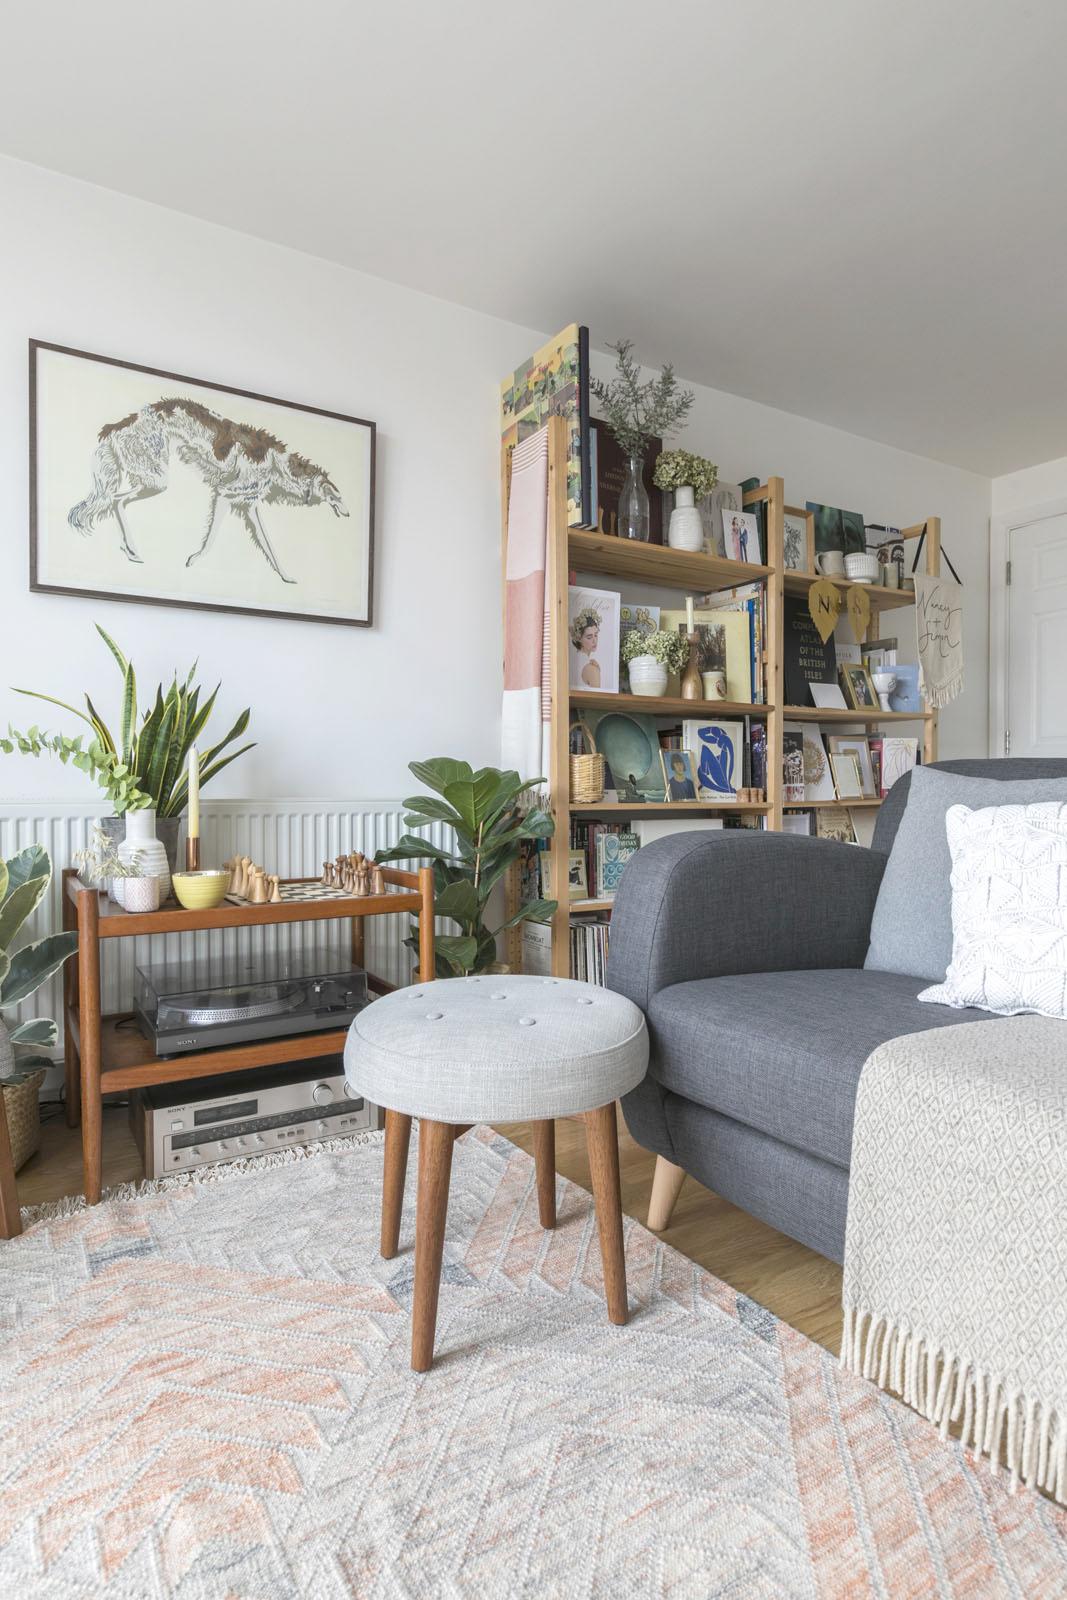 nancy-straughan-interior-stylist-living-room.jpg